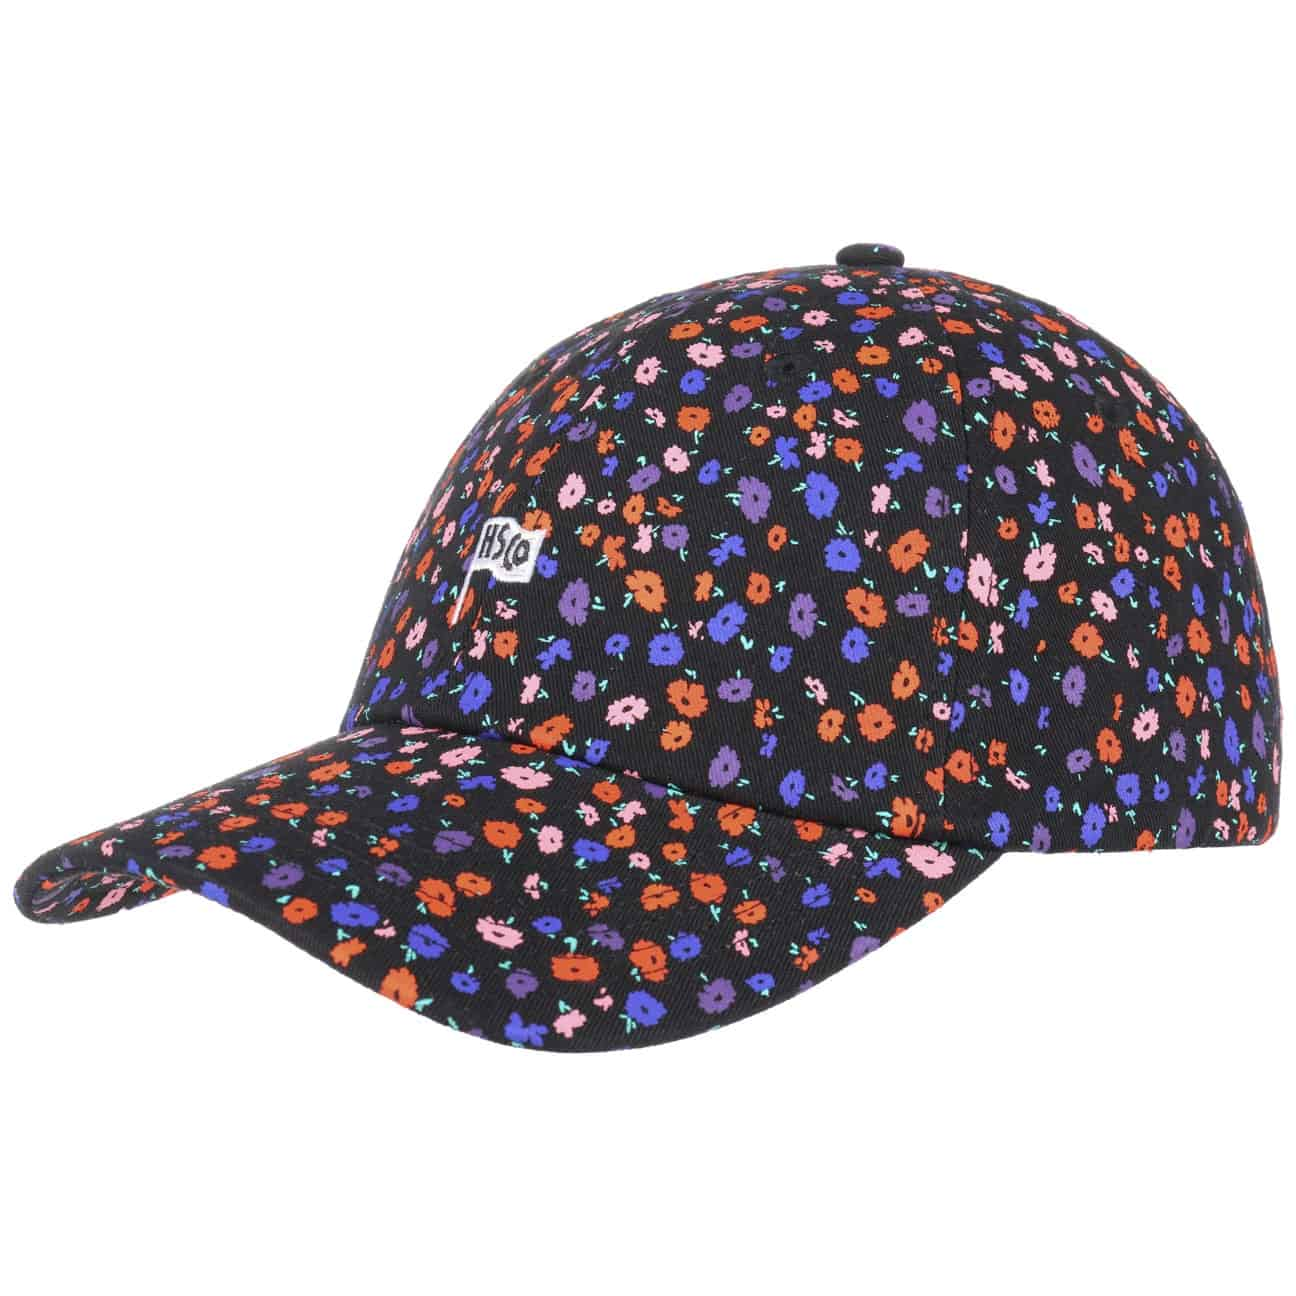 Gorra Flower Allover Strapback by Herschel  gorra de baseball